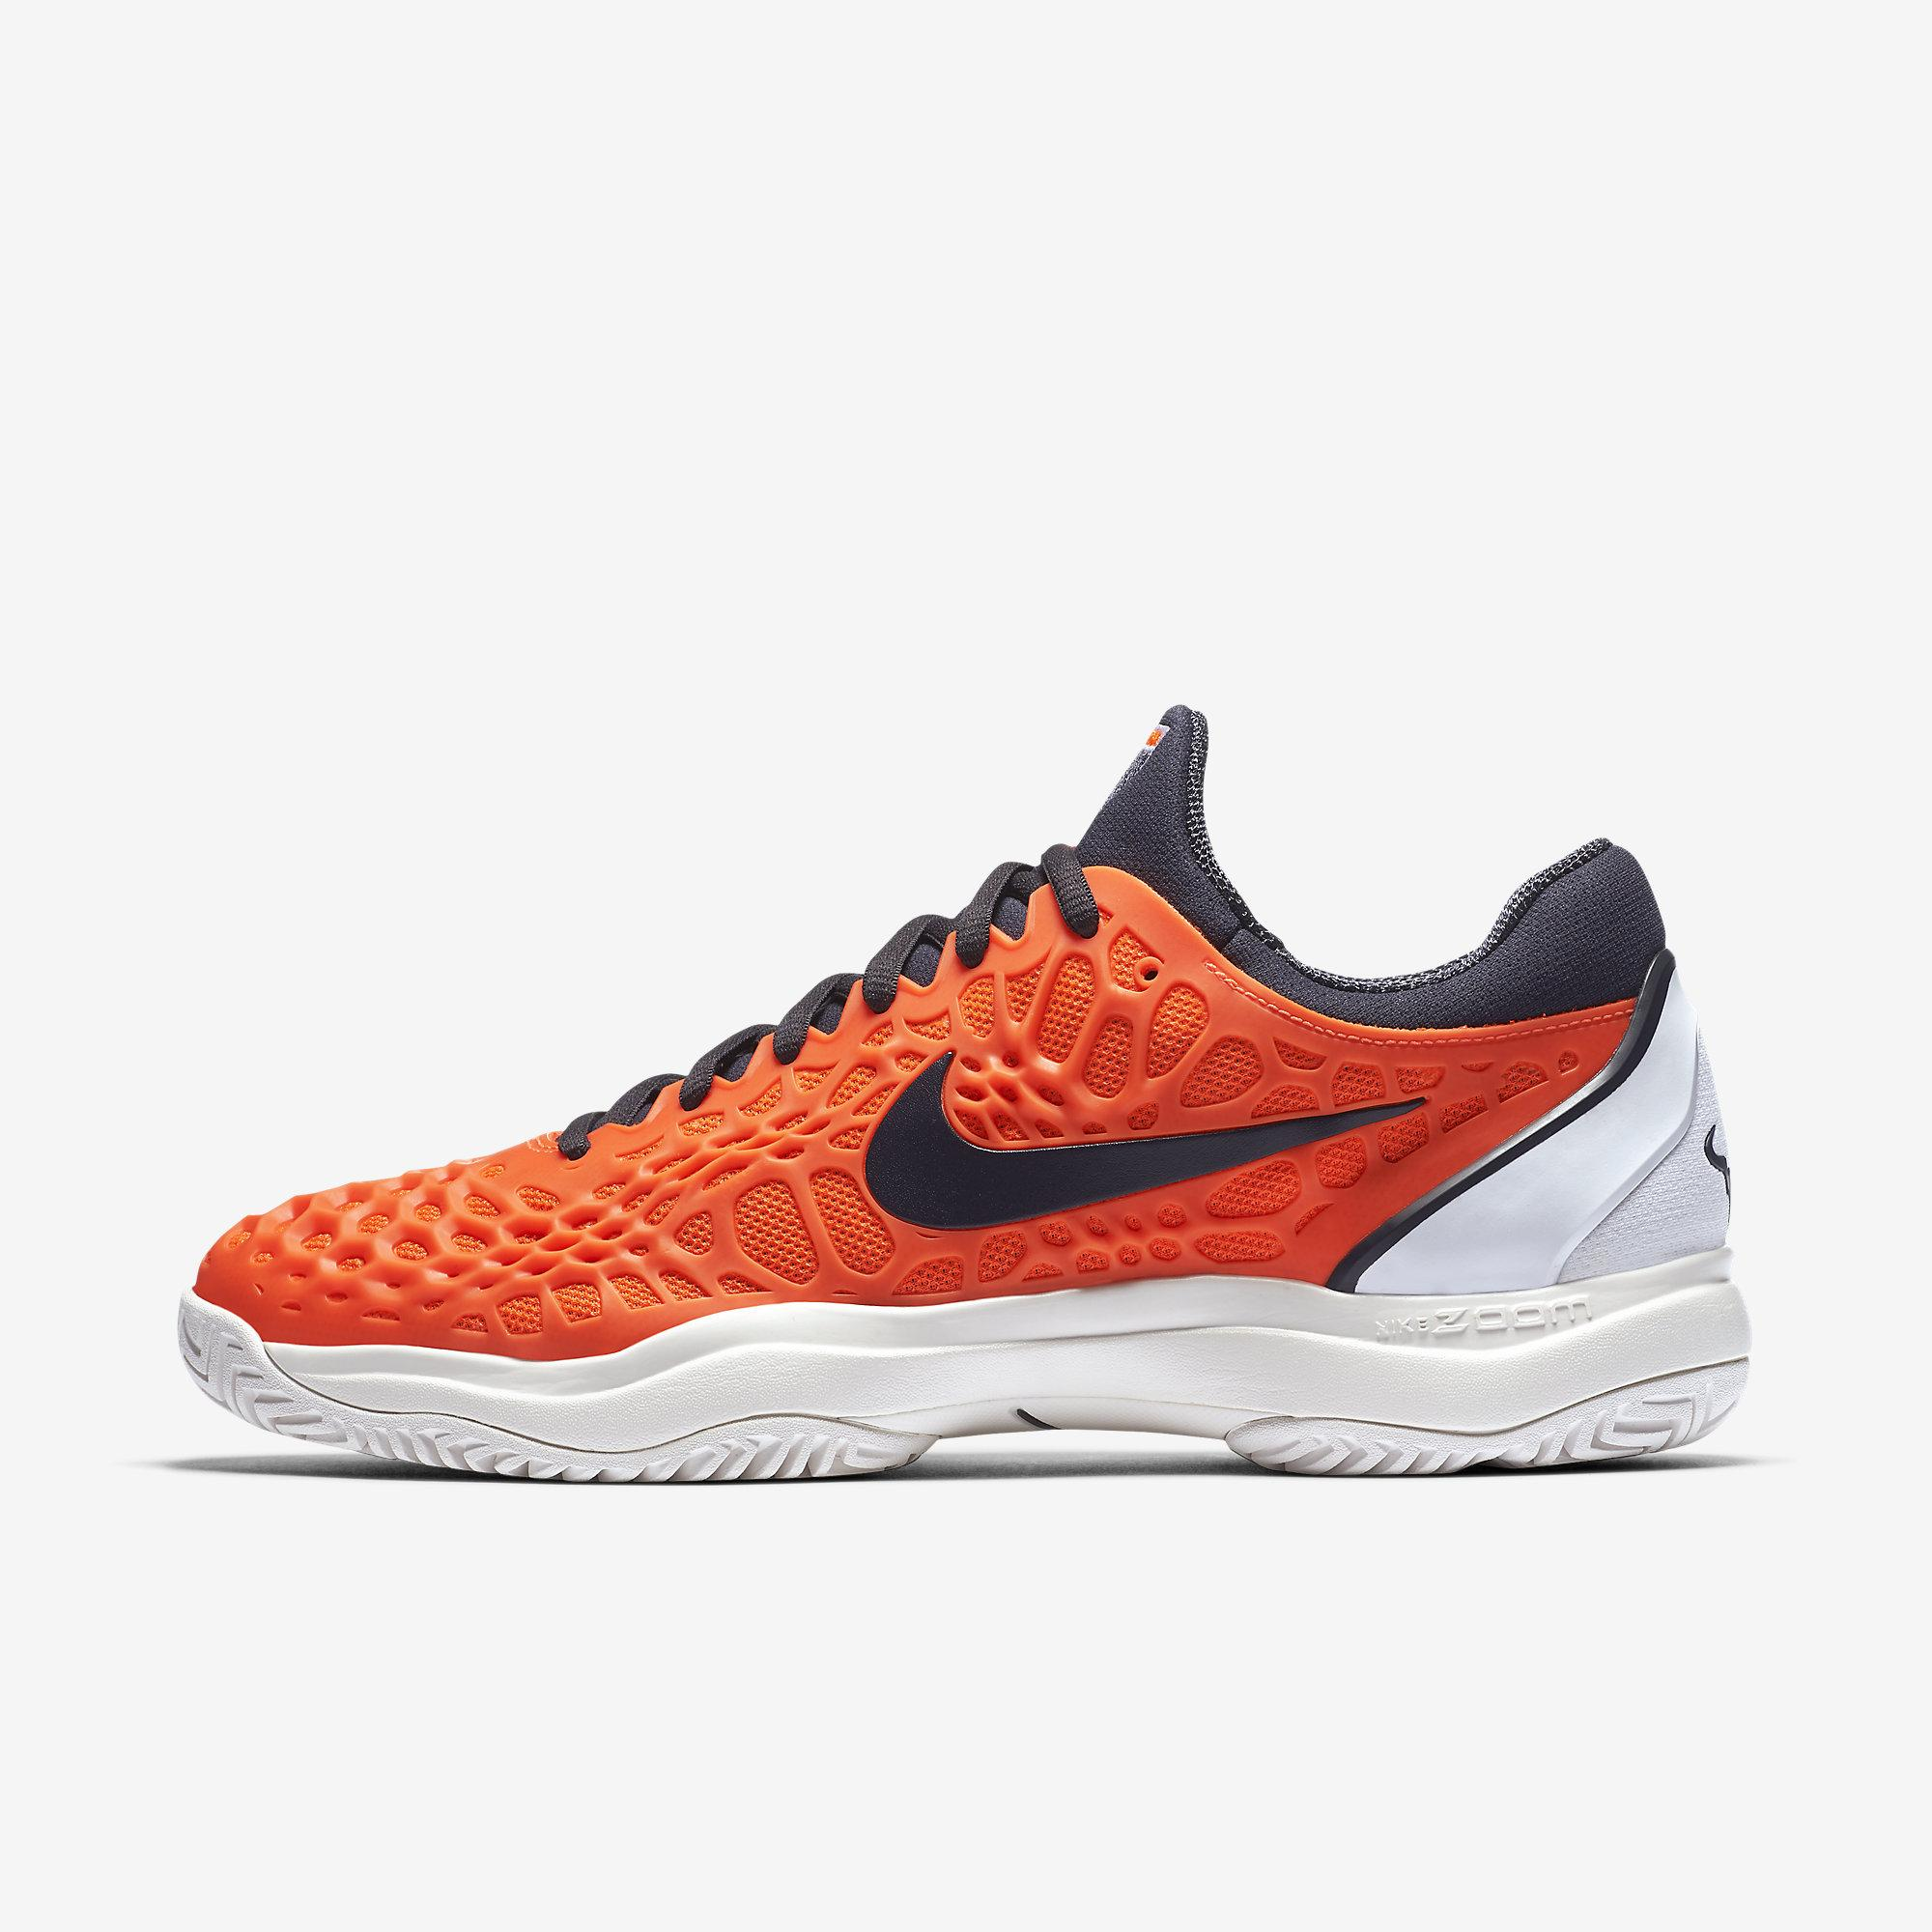 cd2e40da65e0 Nike Mens Zoom Cage 3 Rafa Tennis Shoes - Hyper Crimson White -  Tennisnuts.com